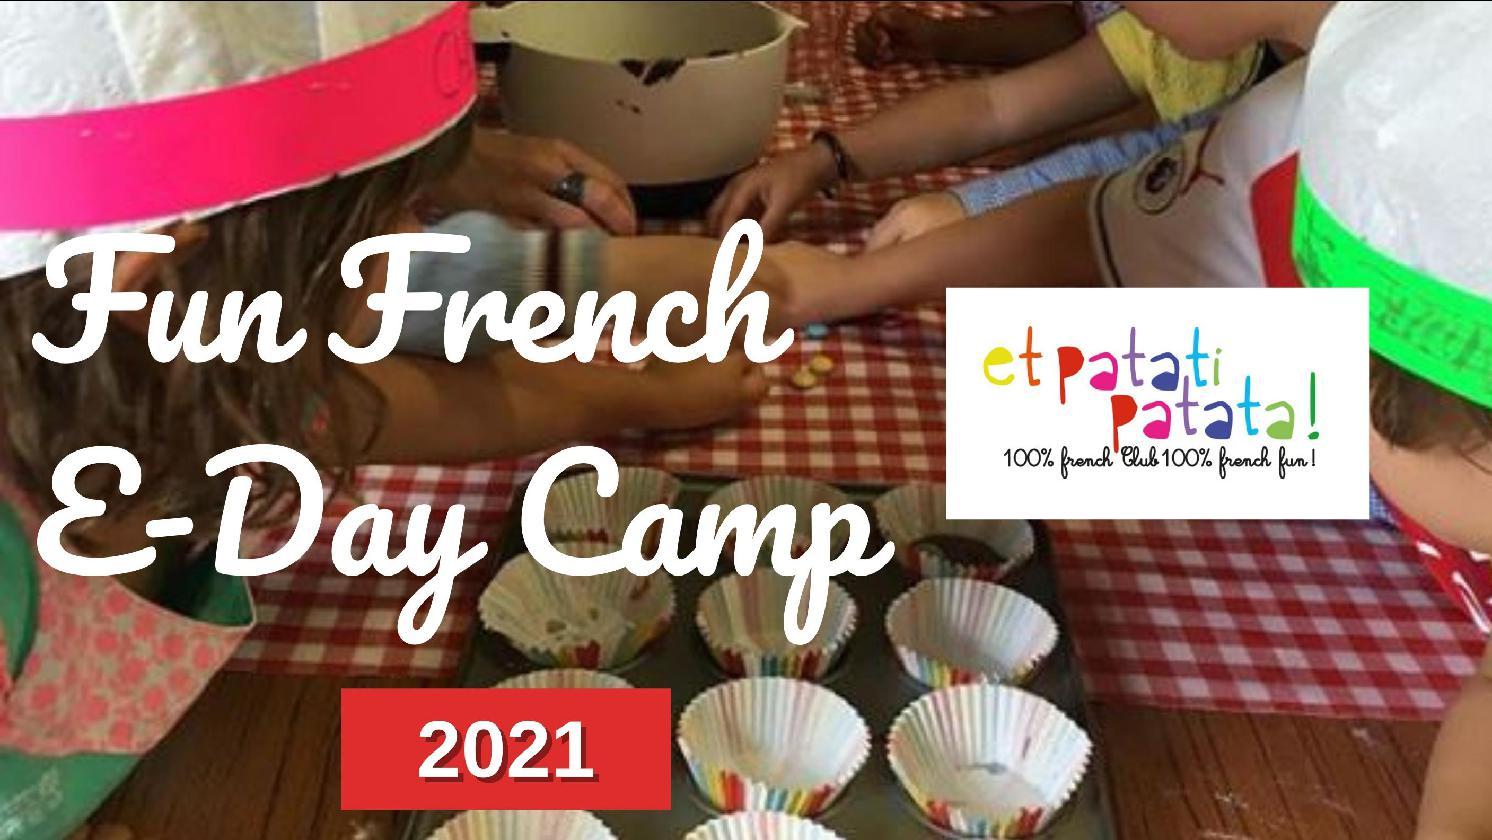 Et Patati Patata – February Fun French E-Day Camp 2021